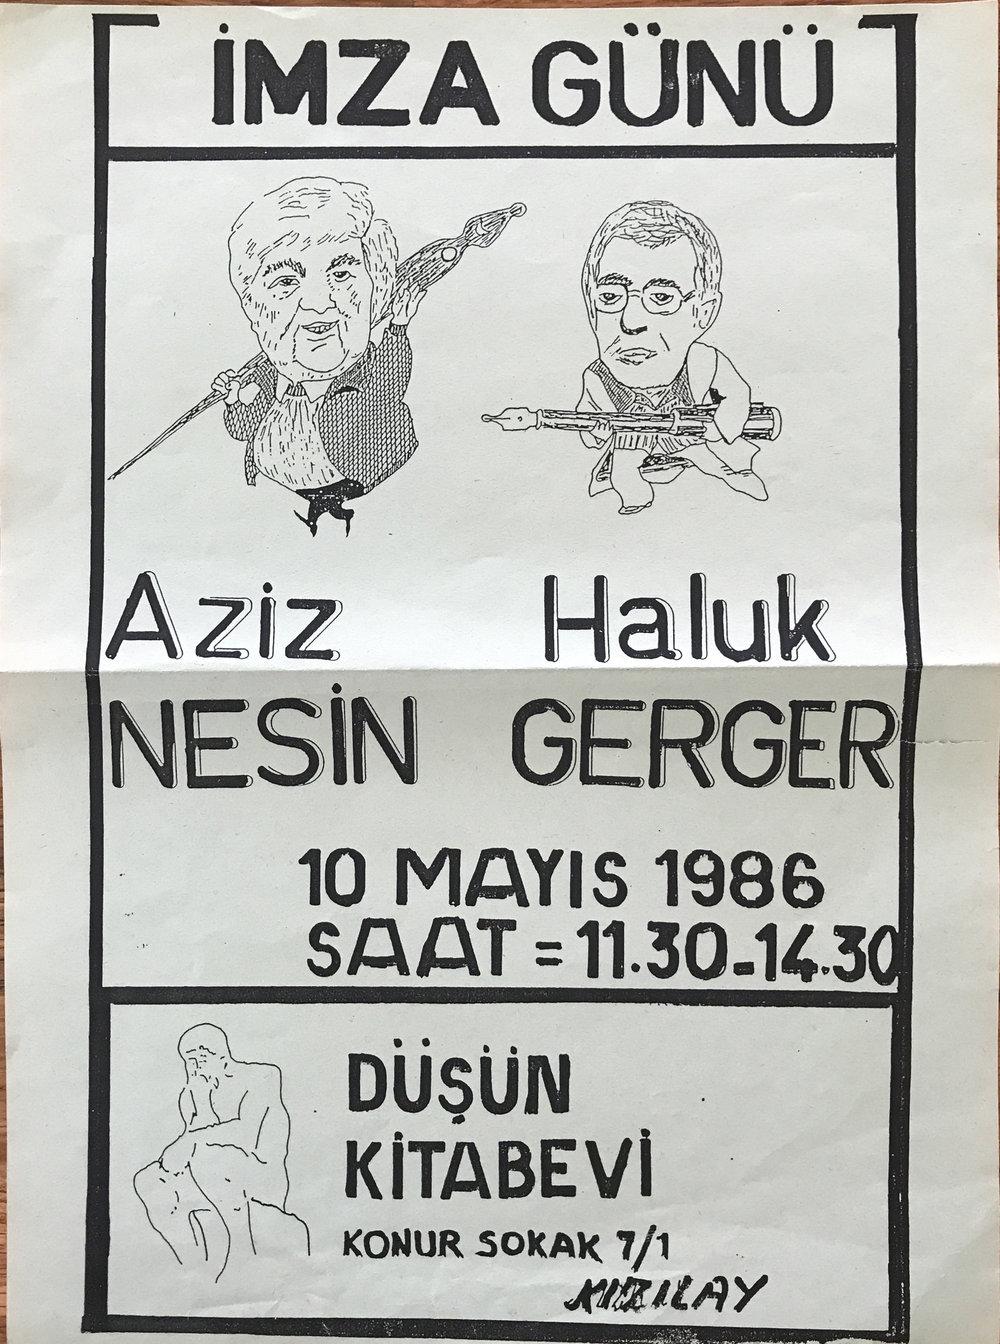 afis-1986-05-10-imza-gunu-aziznesin-halukgerger.JPG